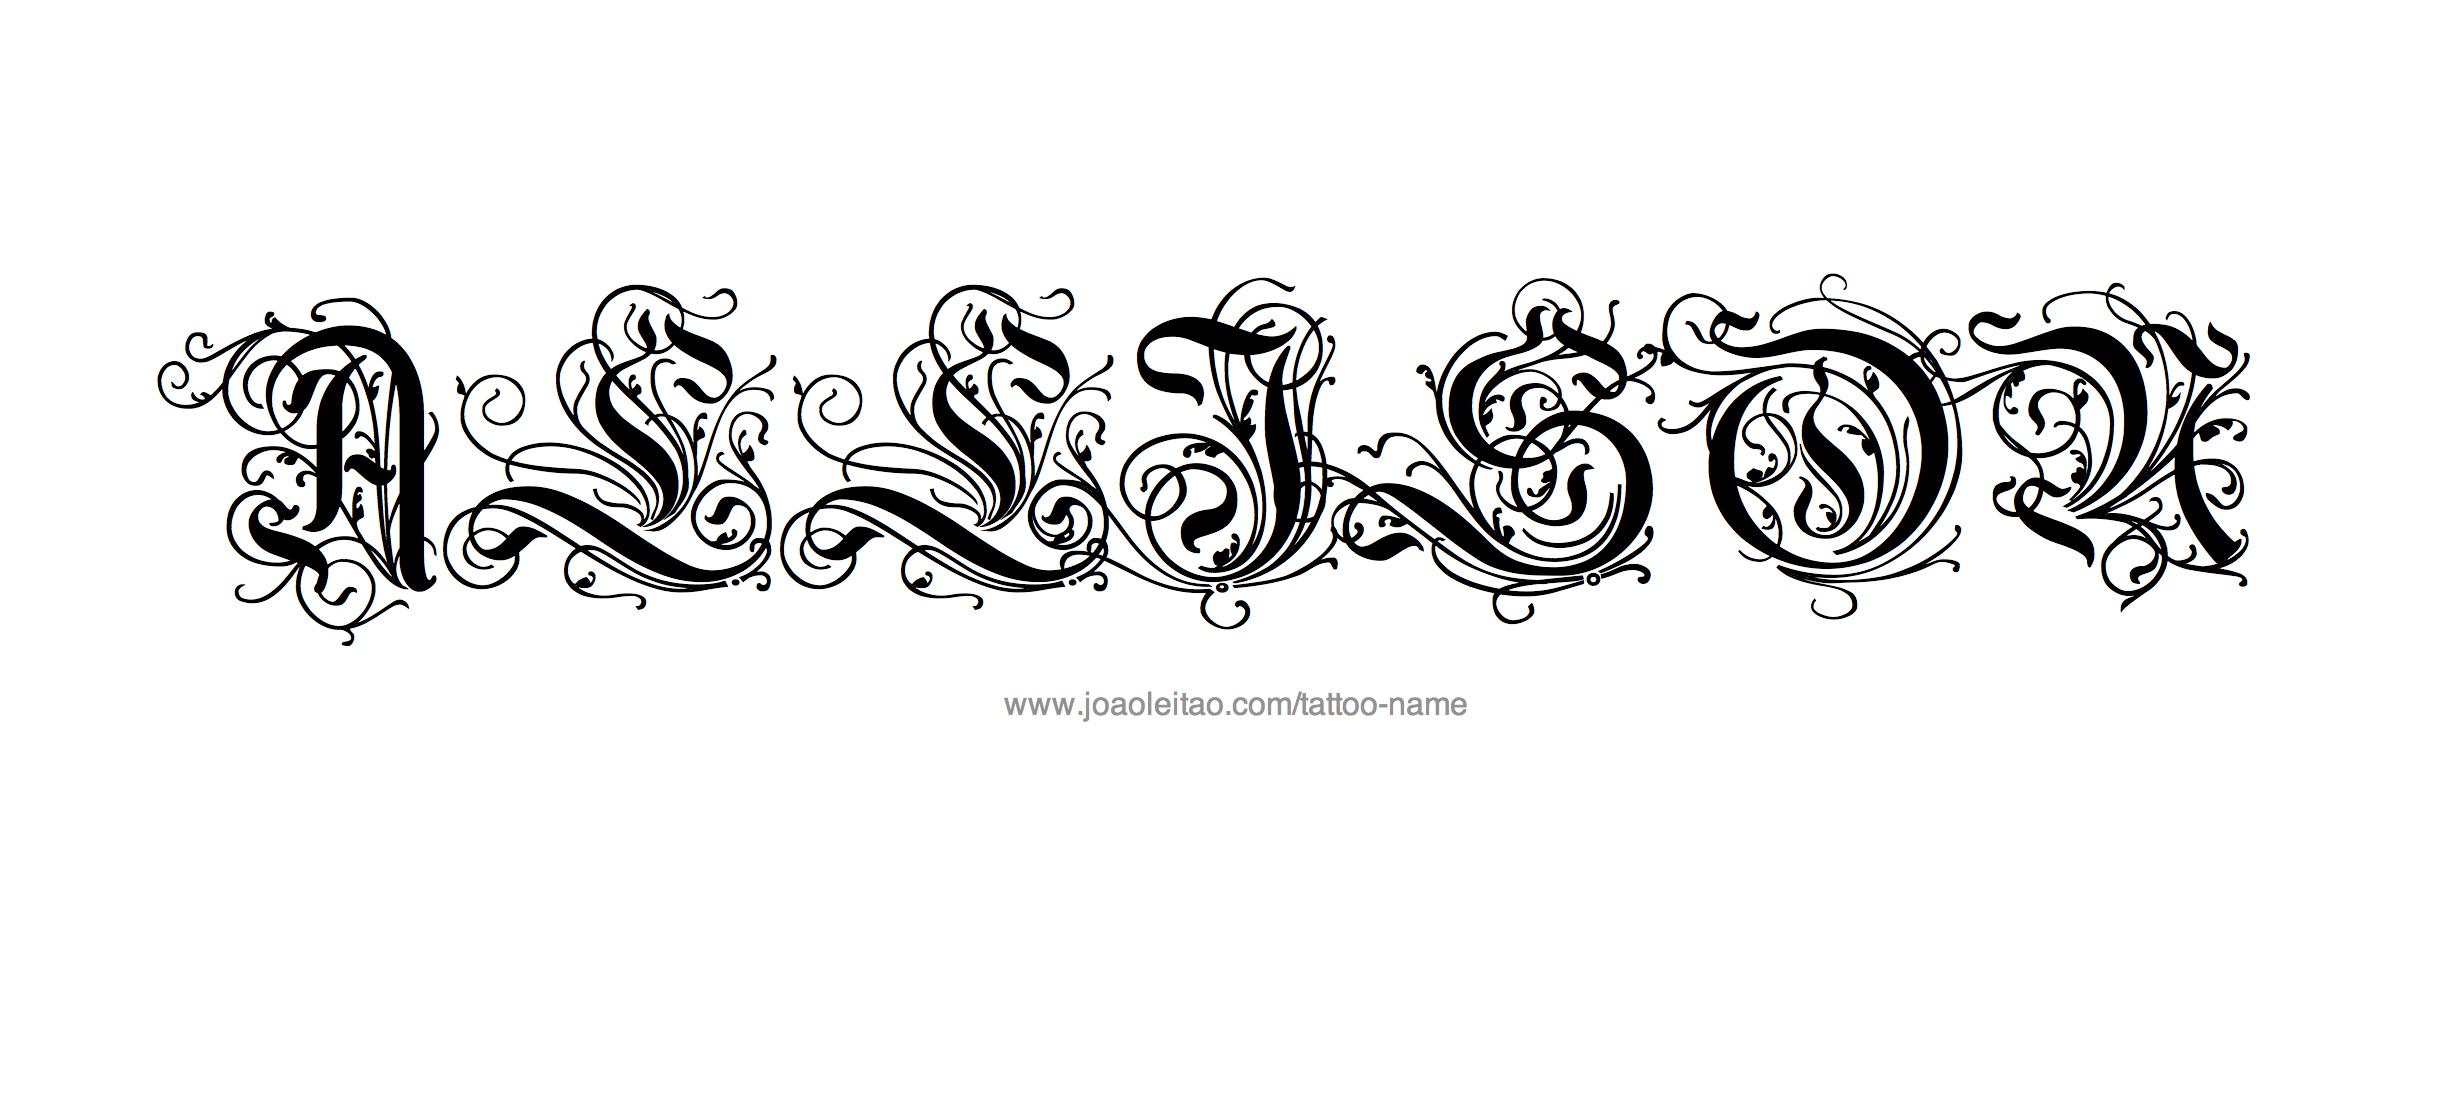 Tattoo Design Name Allison